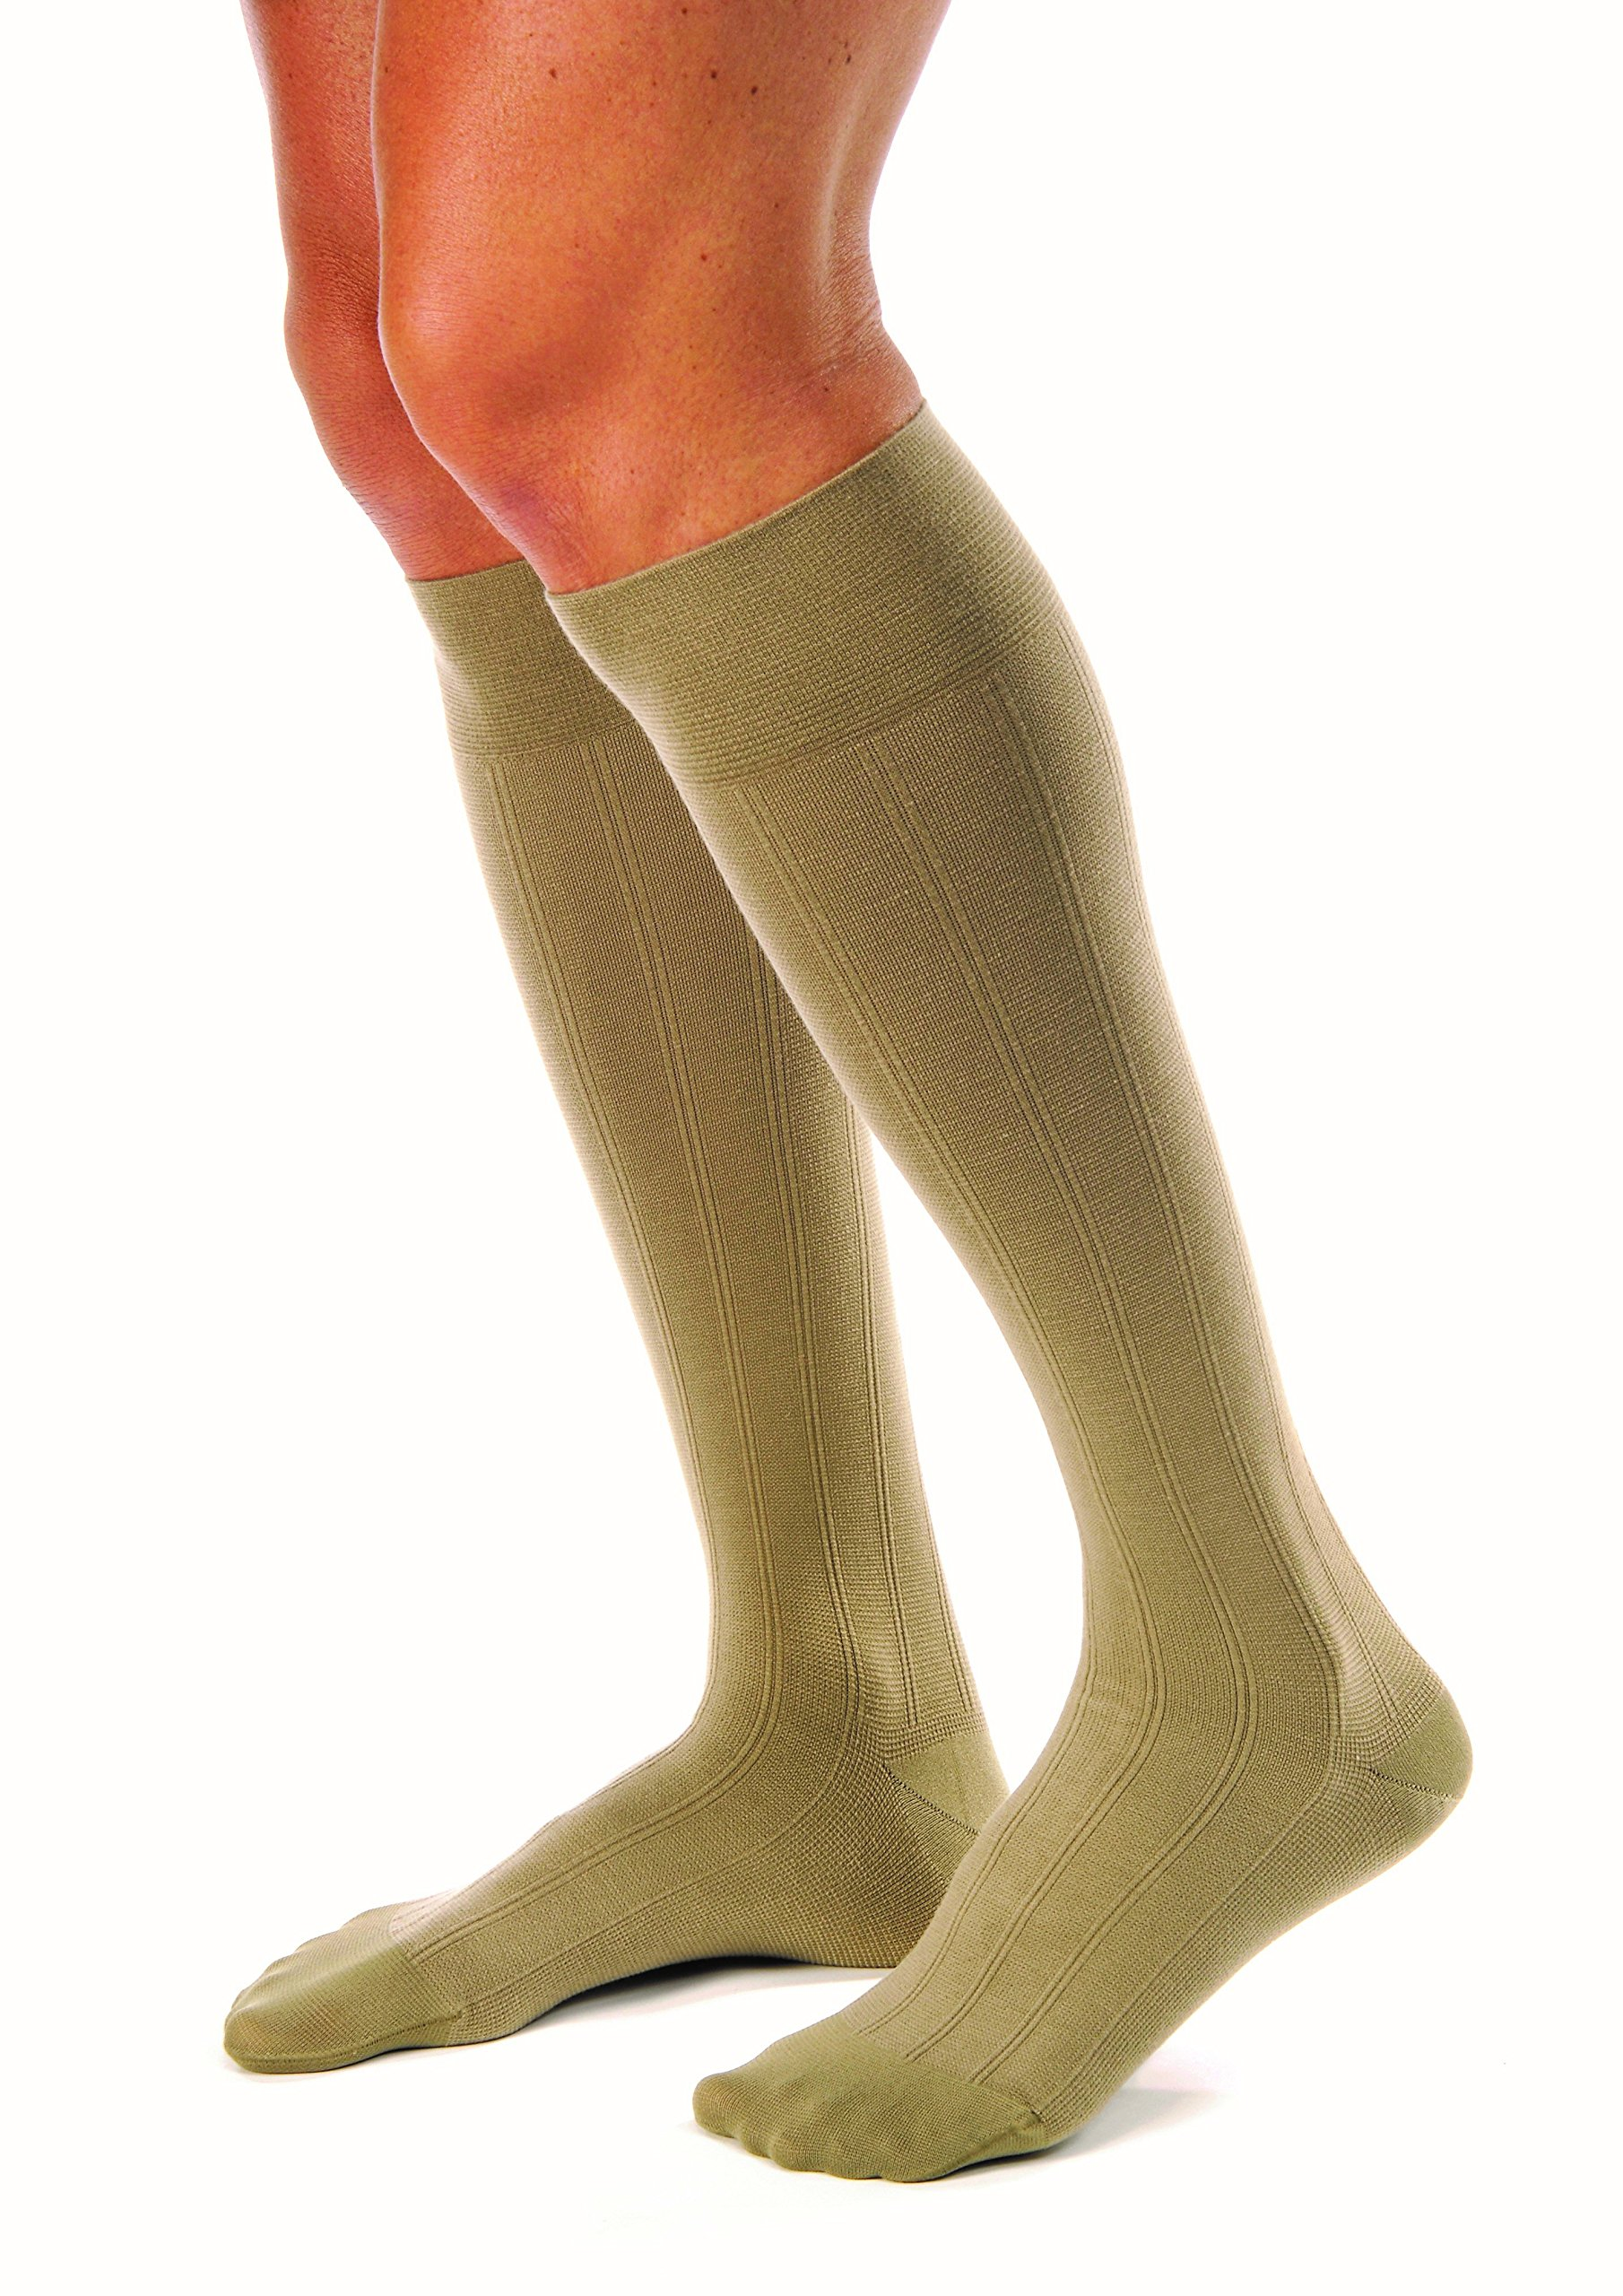 JOBST forMen Casual 20-30 mmHg Knee High Compression Socks, Khaki, Large Full Calf